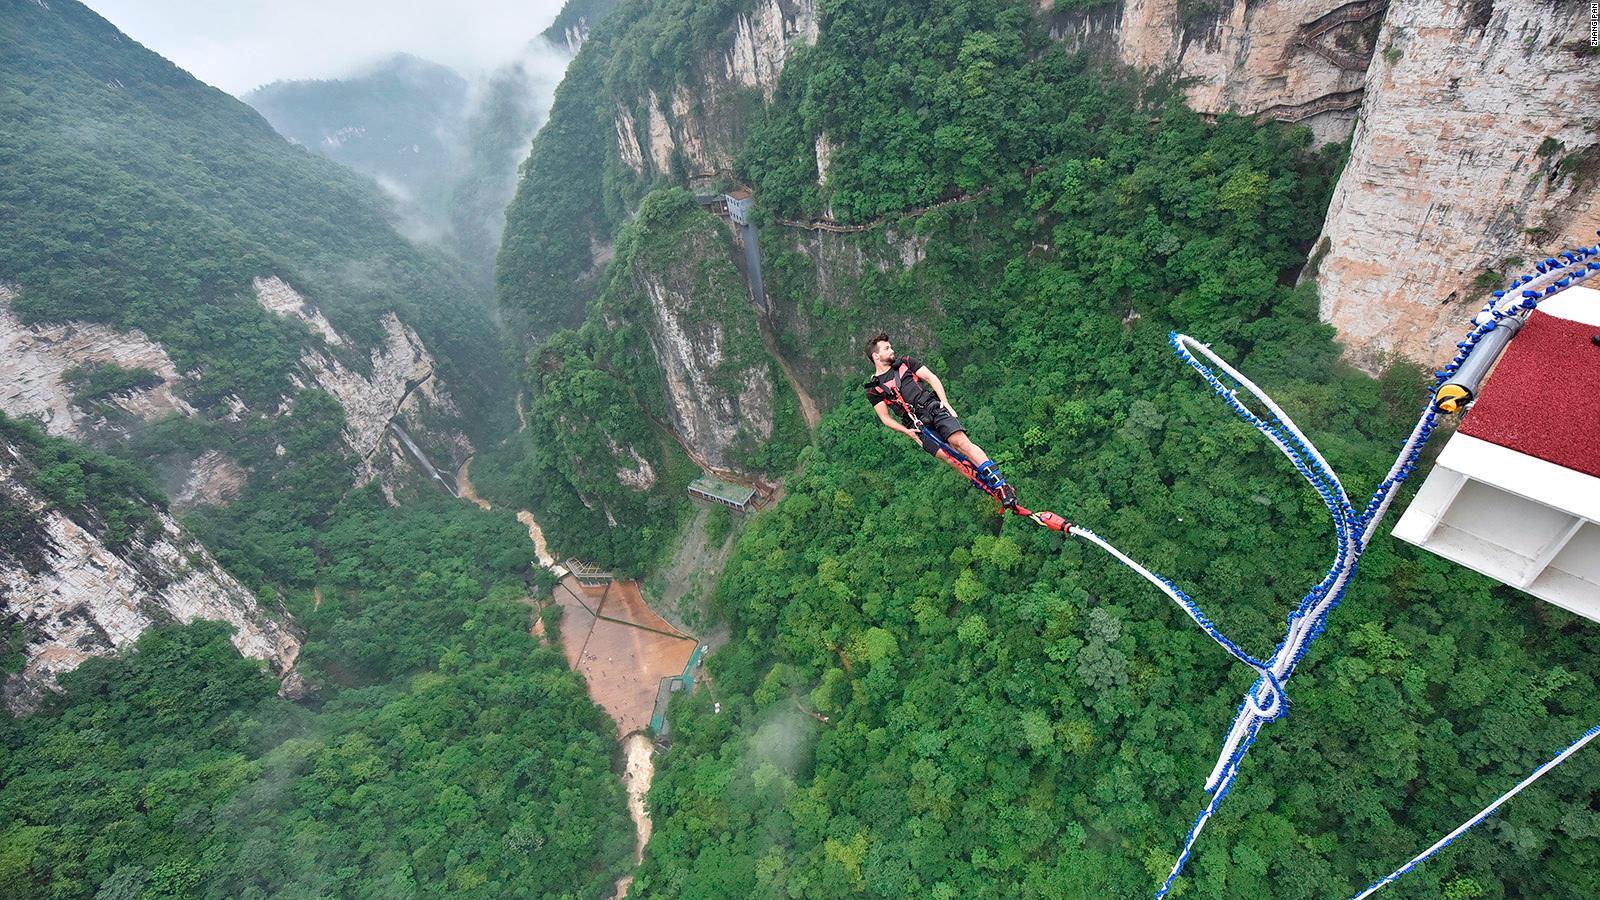 Bungee off the world's highest glass bridge